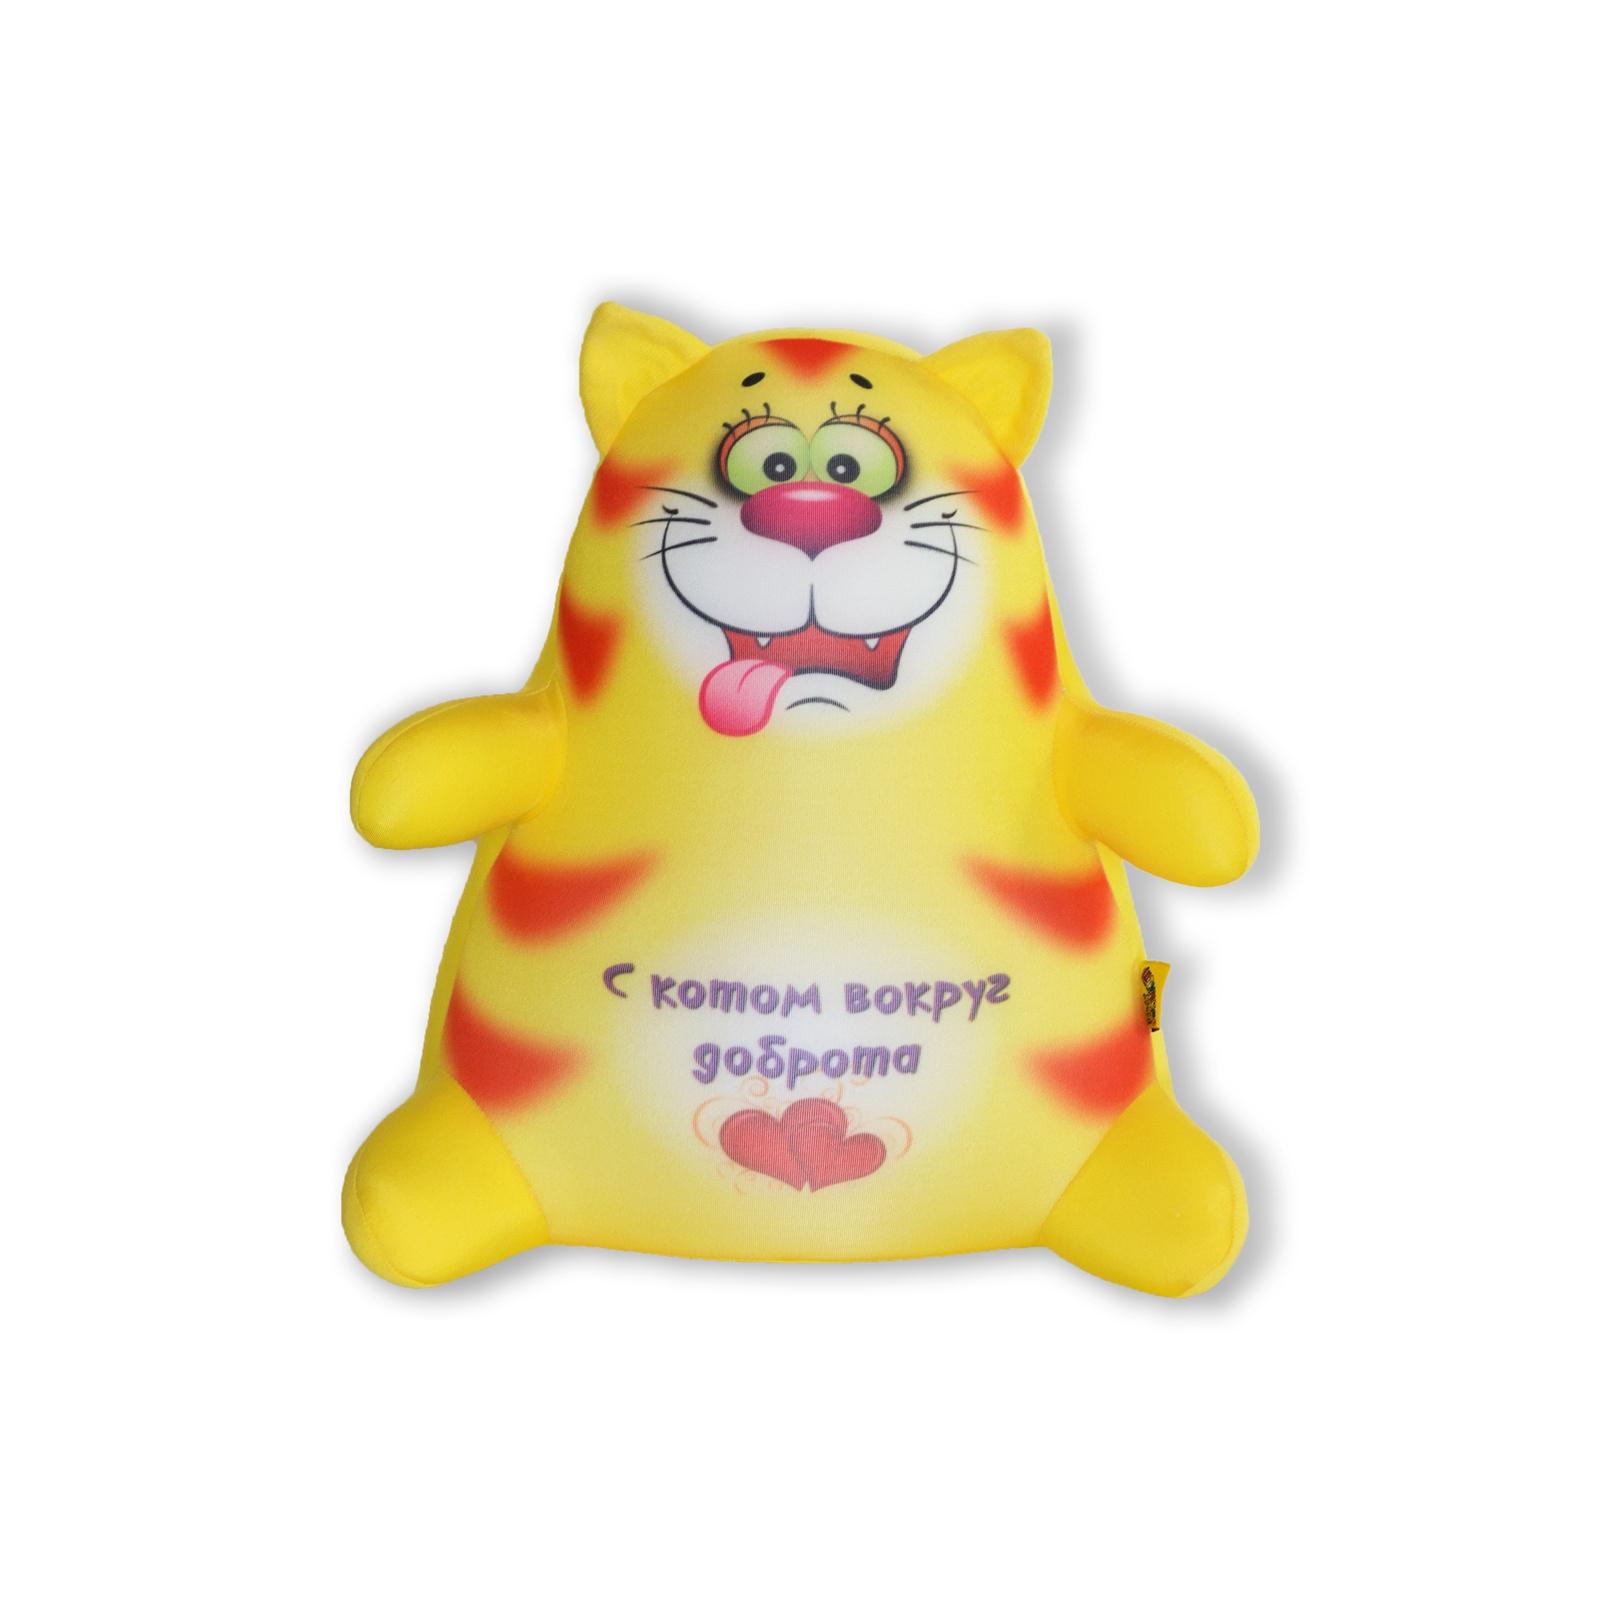 Подушка-игрушка Штучки, к которым тянутся ручки антистресс Котики Обормотики, желтый, желтый